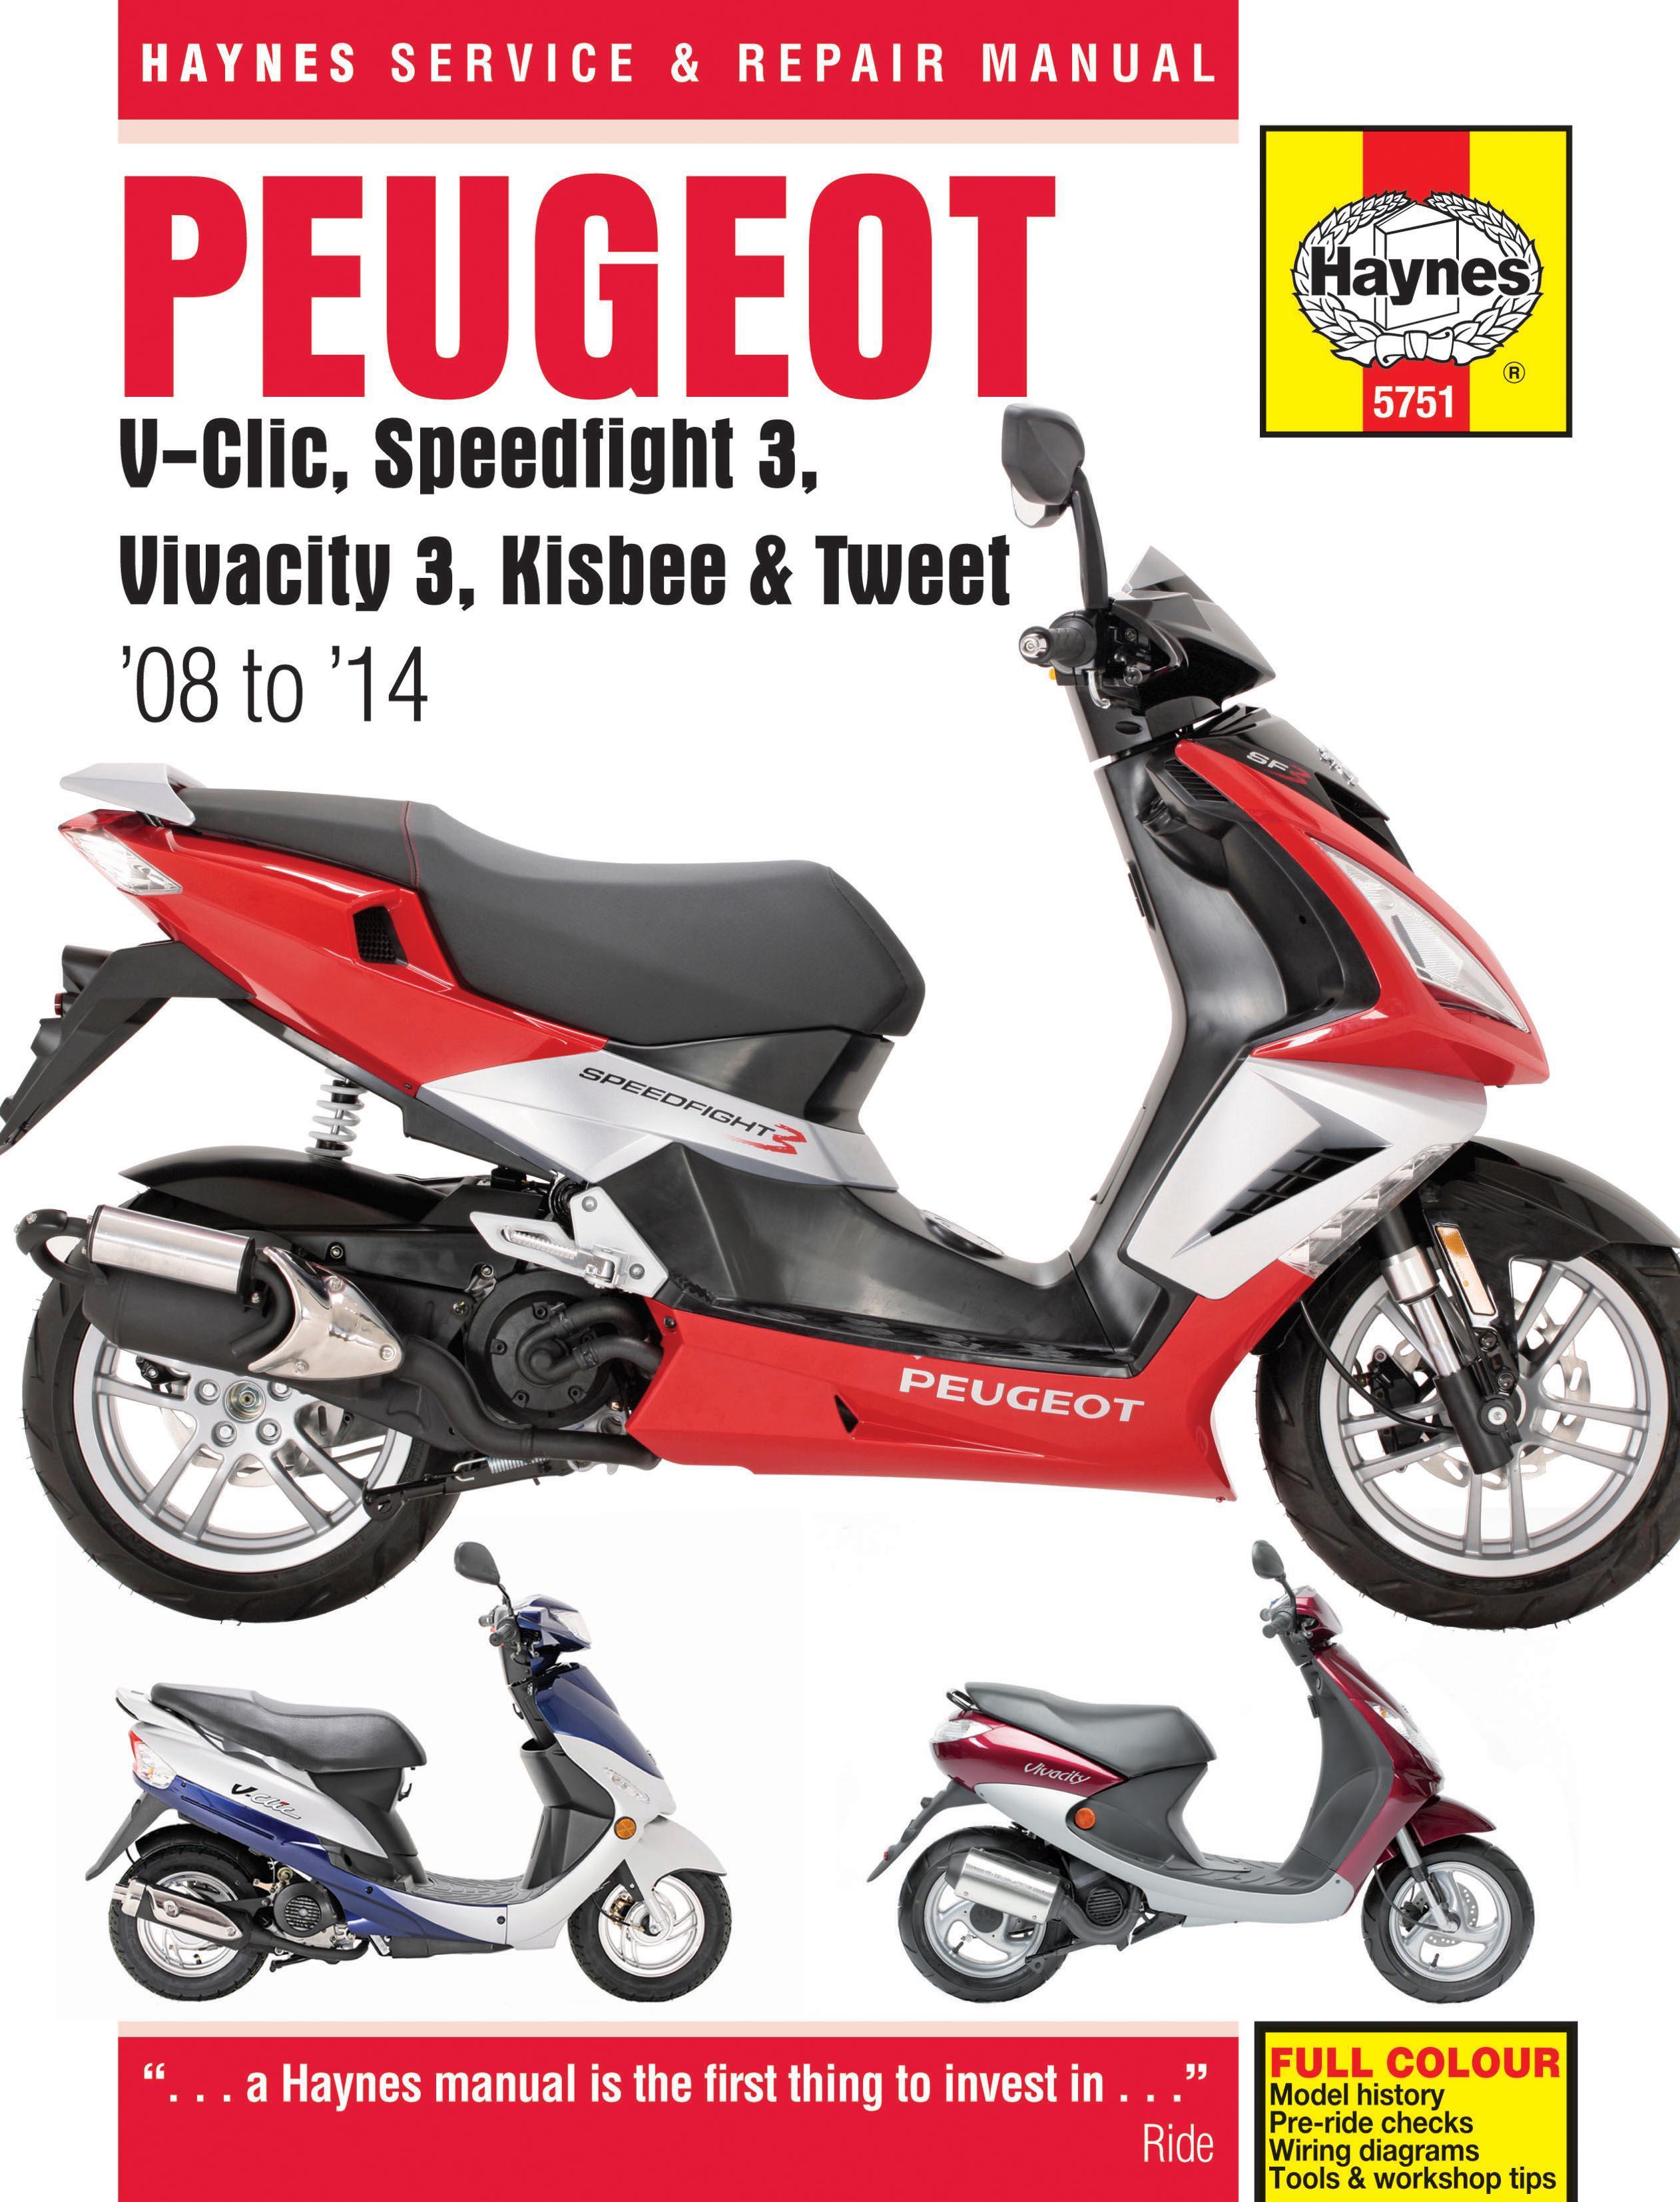 Haynes Peugeot V-Clic Speedfight 3 Vivacity 3 Workshop Service Repair Manual